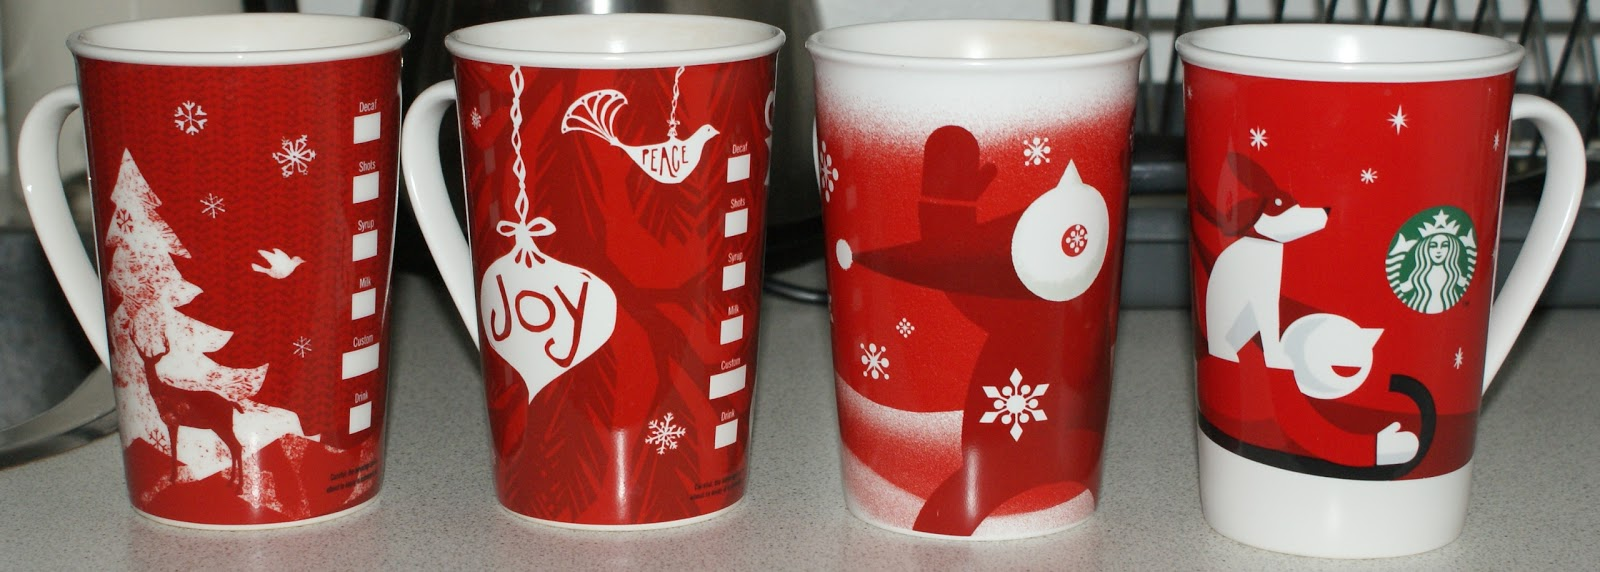 HotchPotch Ehhh December 12th Starbucks Annual